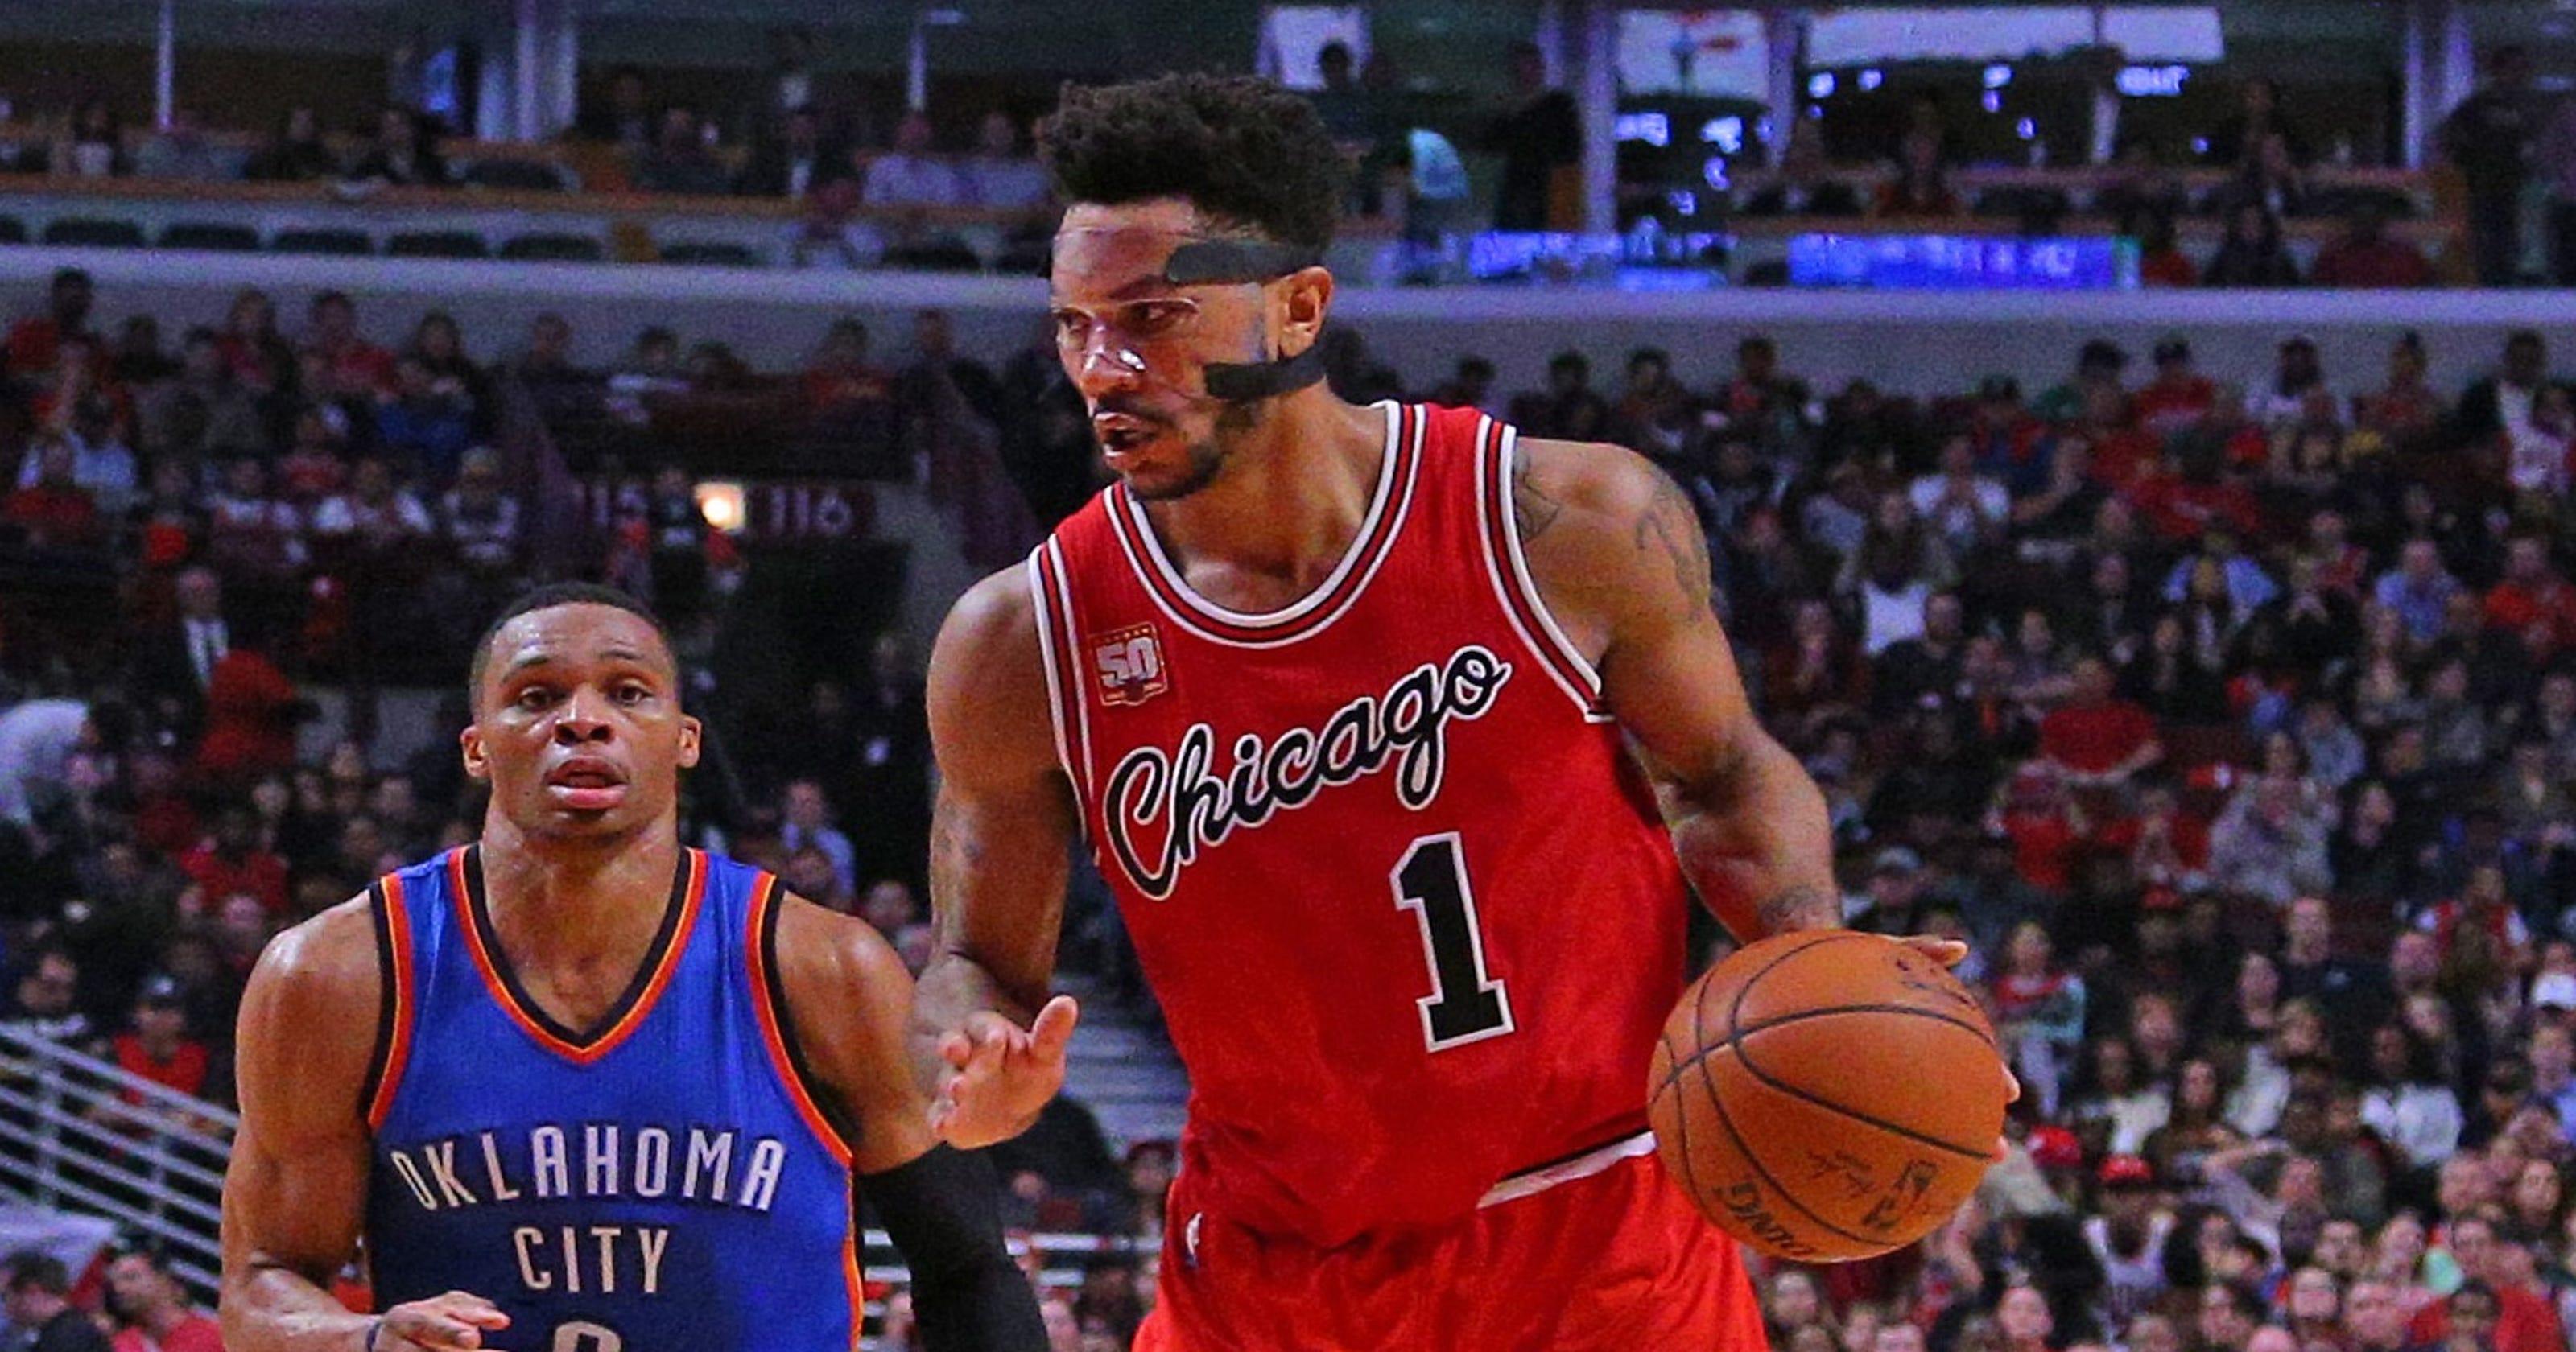 862c24382460 Derrick Rose s late surge pushes Bulls past Thunder